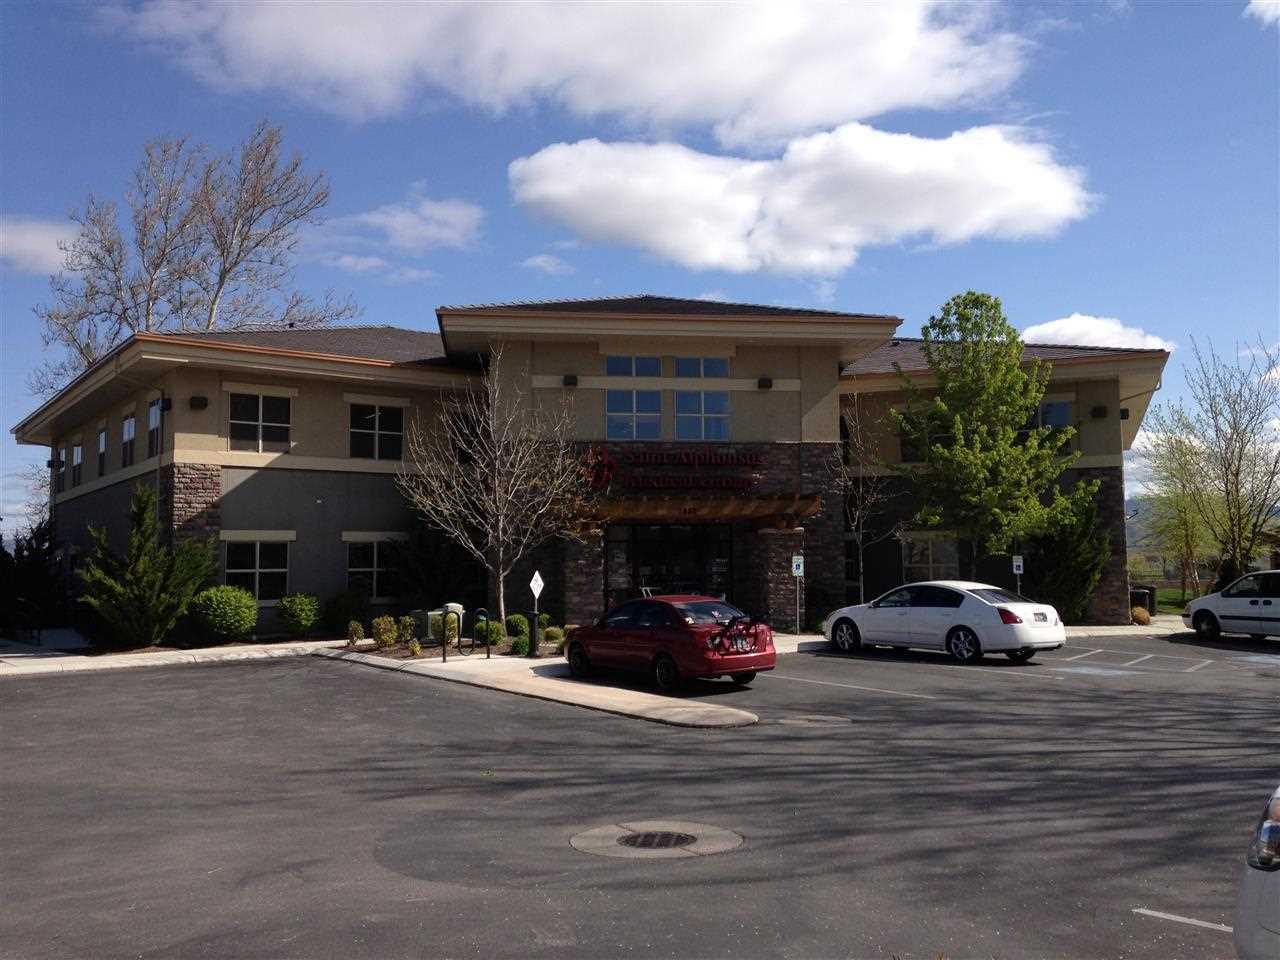 1880 W Judith Ln.,Boise,Idaho 83705,Business/Commercial,1880 W Judith Ln.,98573771